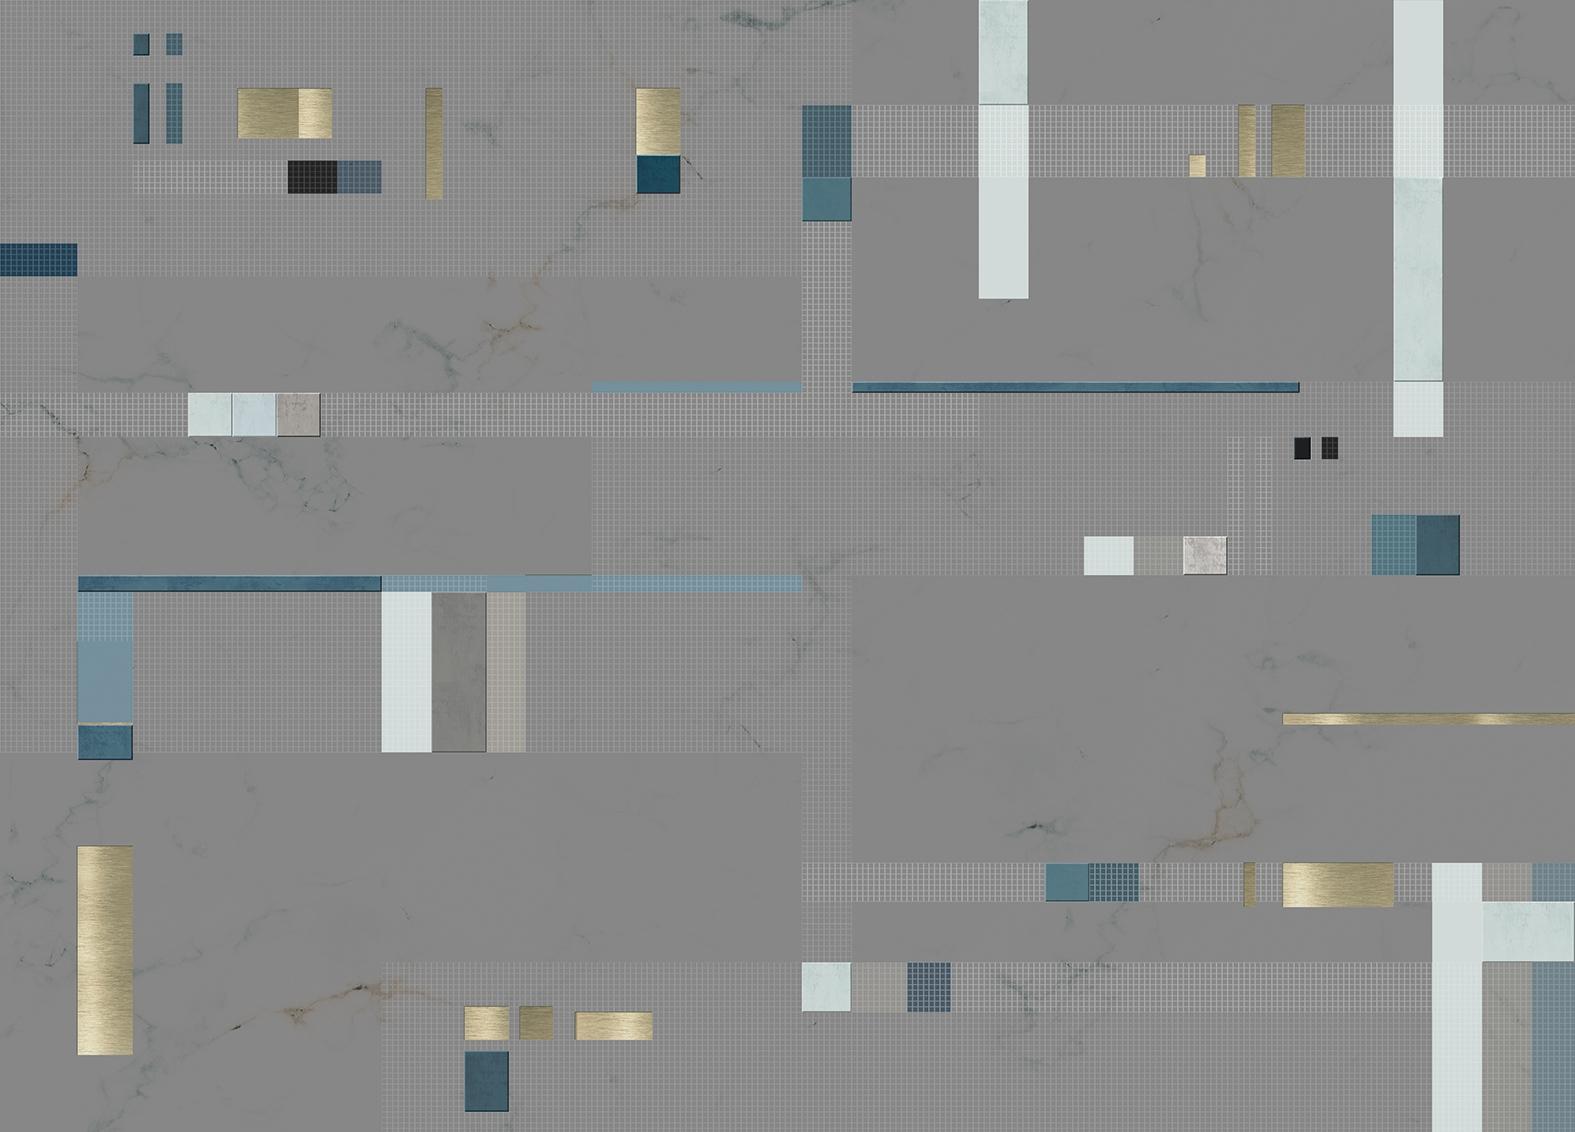 Mural Pixels Turquoise